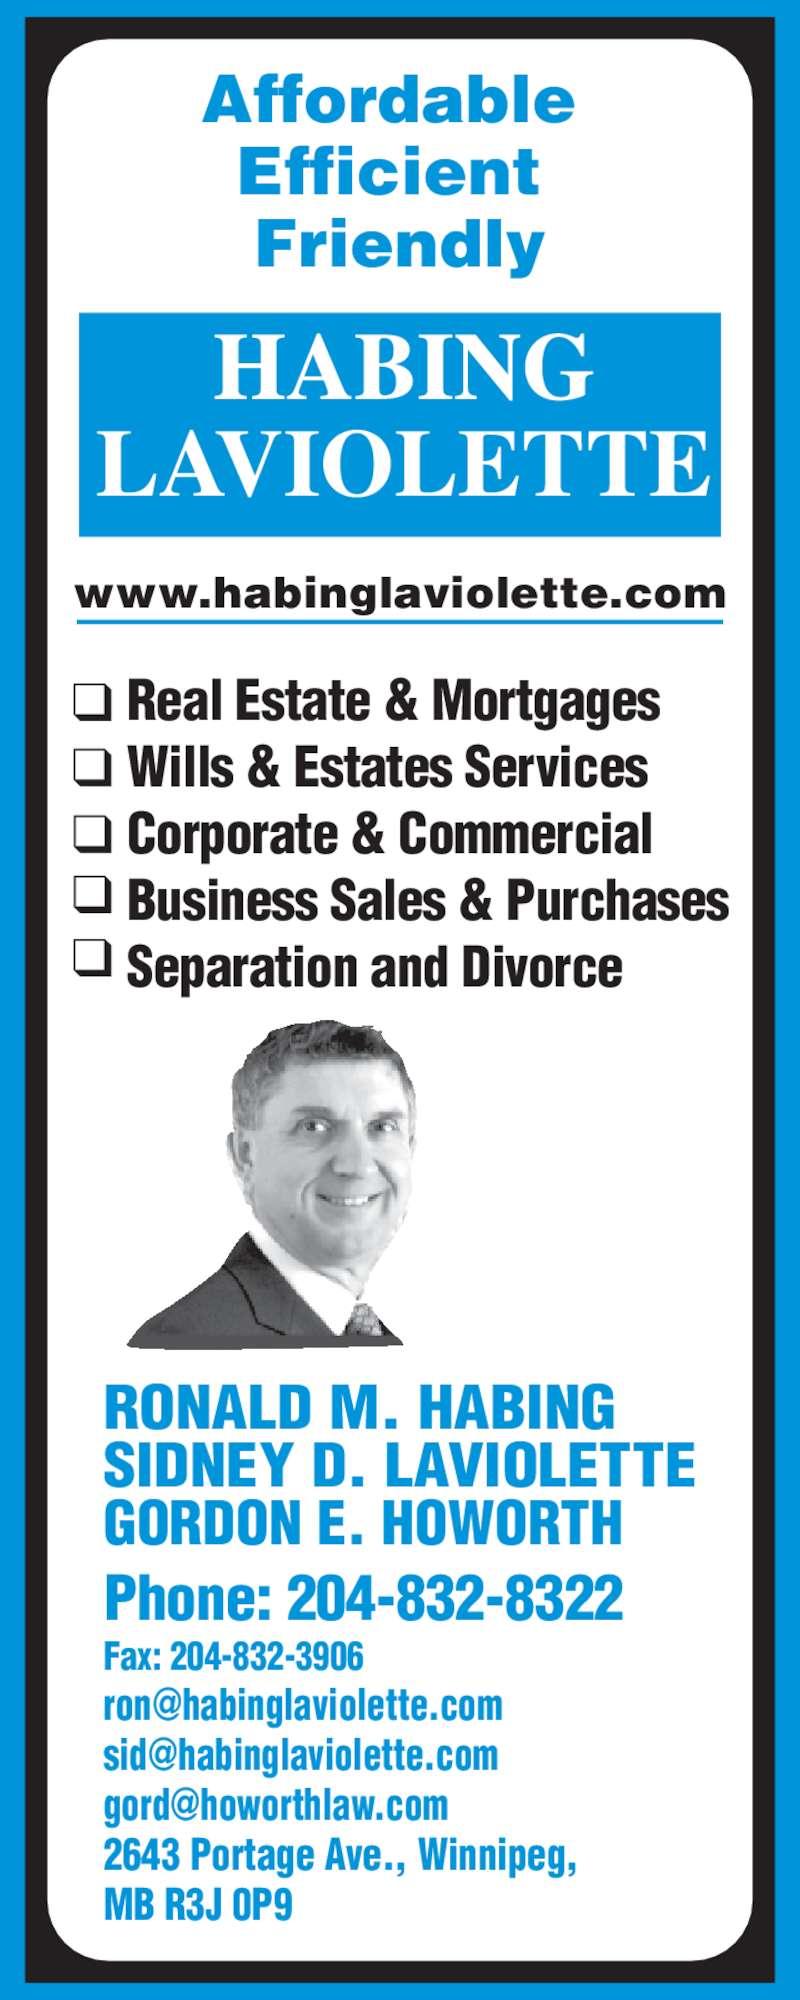 Habing Laviolette (204-832-8322) - Display Ad - Business Sales & Purchases Separation and Divorce Corporate & Commercial Affordable  Efficient  Friendly LAVIOLETTE www.habinglaviolette.com RONALD M. HABING SIDNEY D. LAVIOLETTE GORDON E. HOWORTH Phone: 204-832-8322 Fax: 204-832-3906 2643 Portage Ave., Winnipeg,  MB R3J 0P9 Real Estate & Mortgages Wills & Estates Services